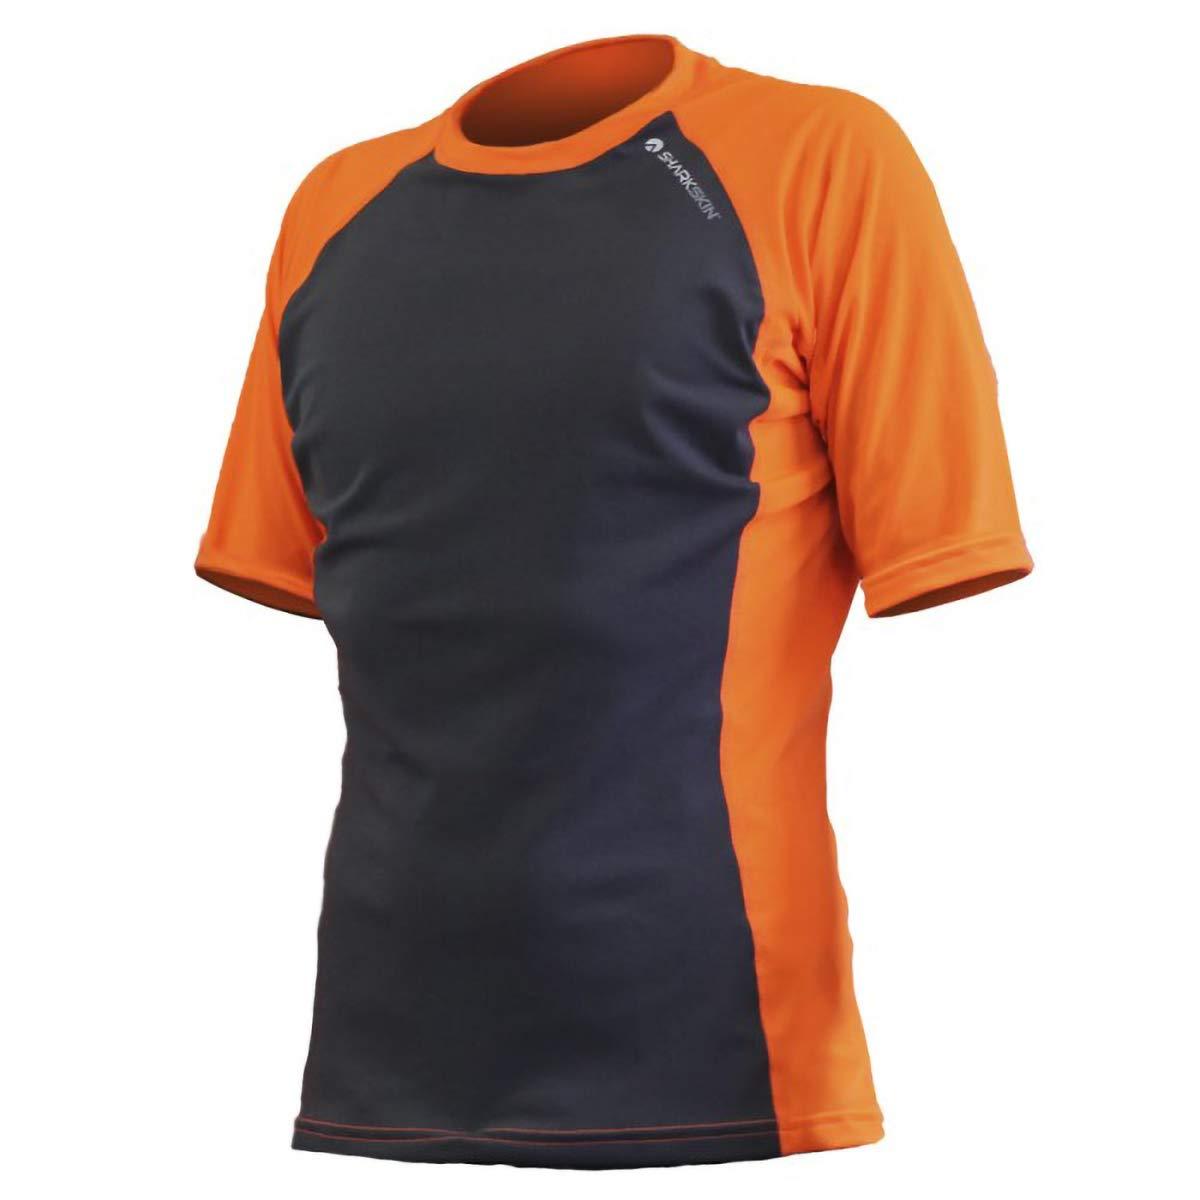 Sharkskin Rapid Dry Unisex Short Sleeve Shirt